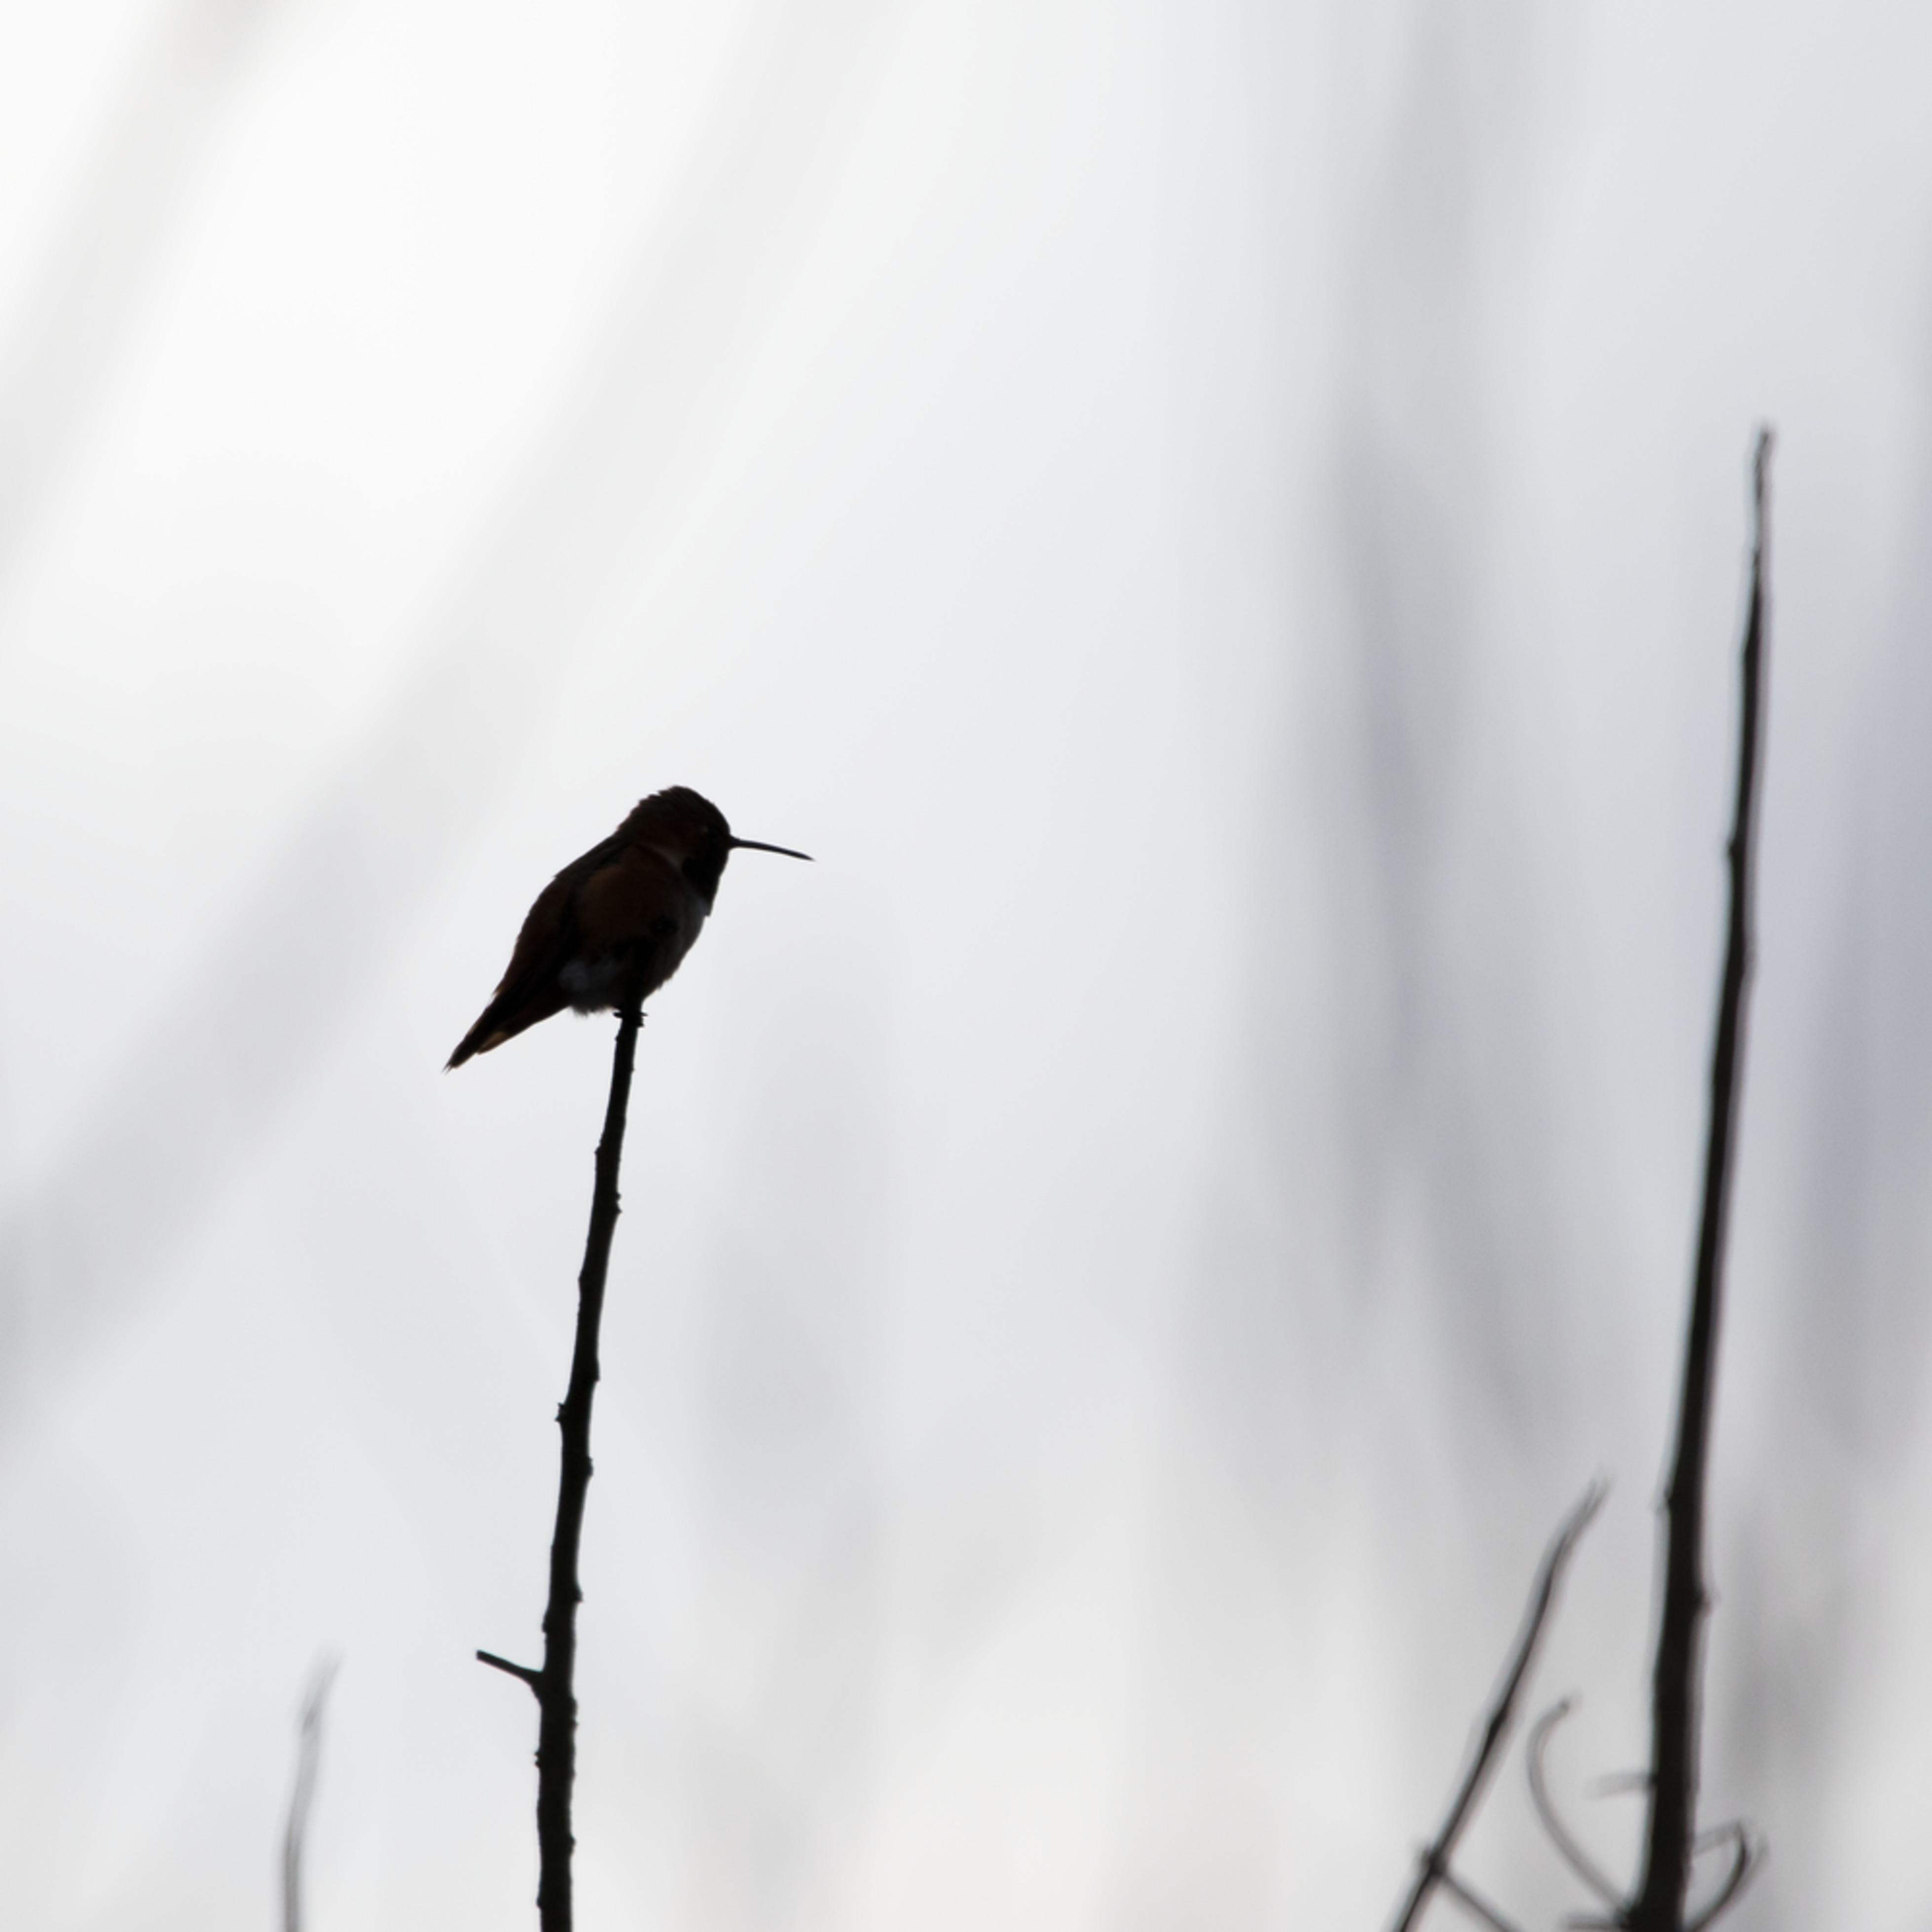 Bird silouette lesc3n